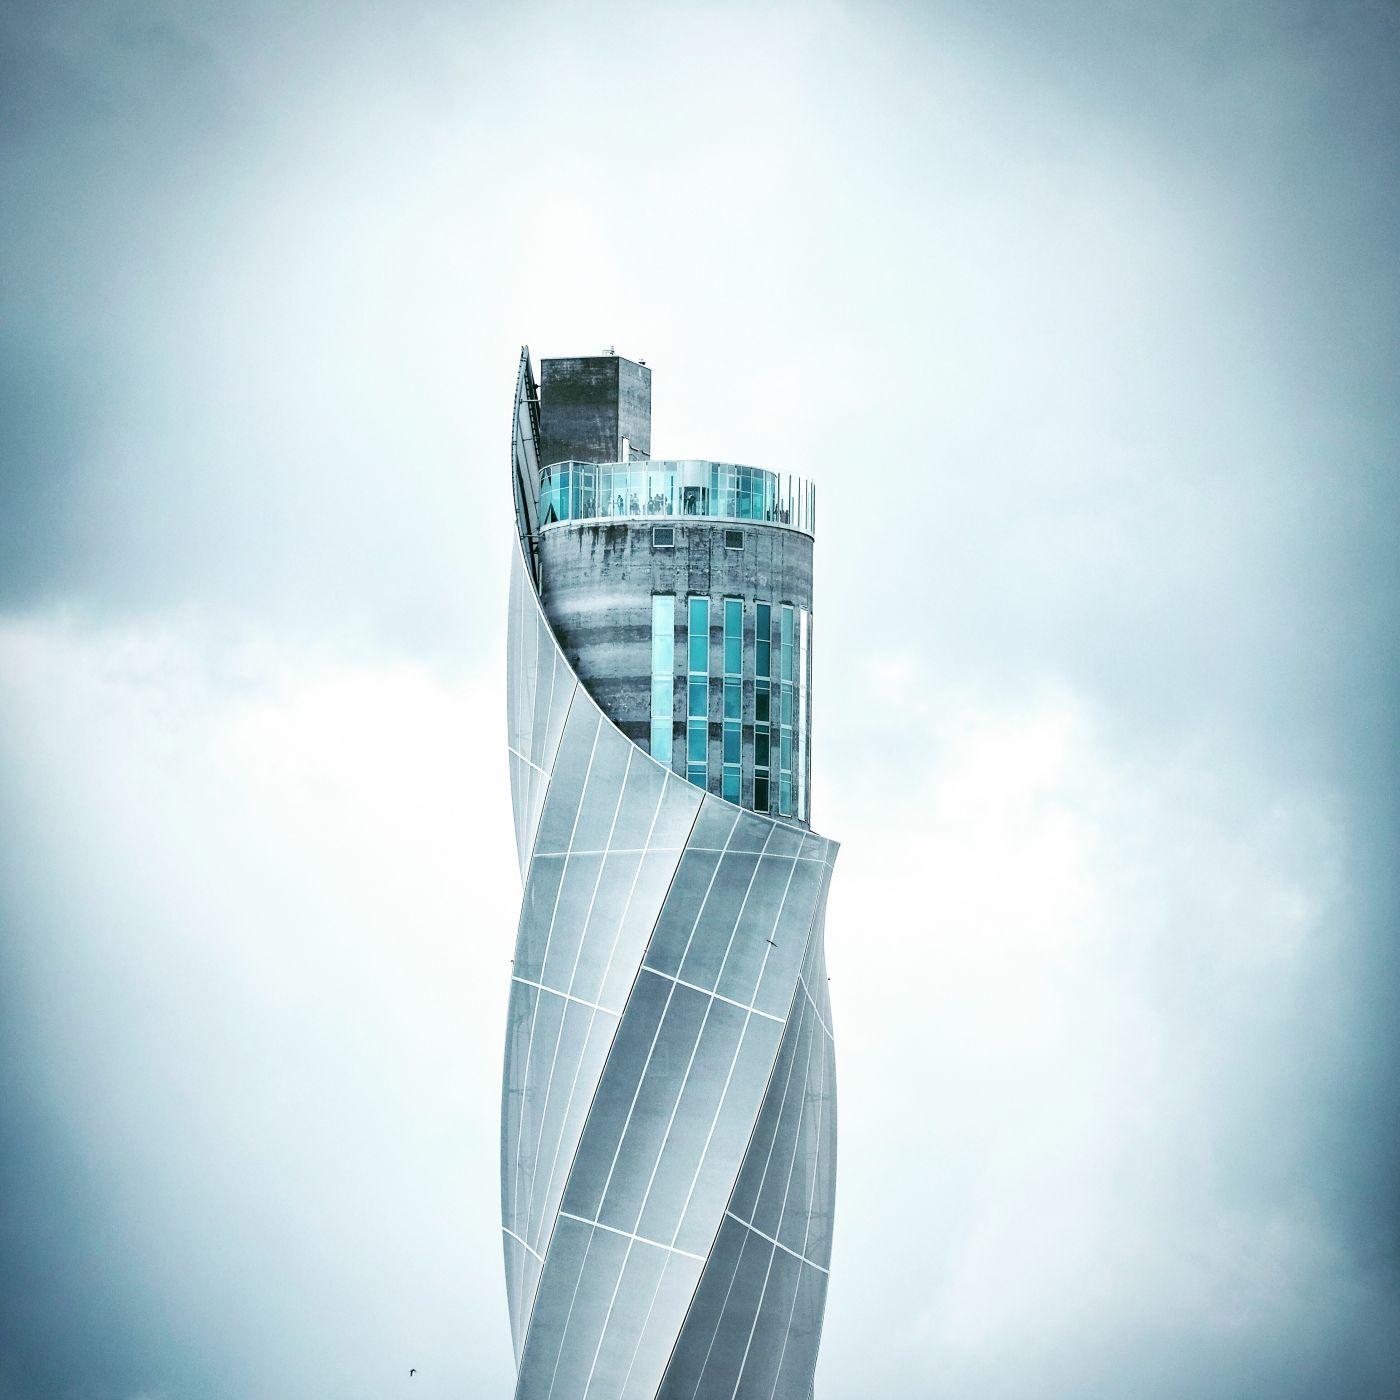 Rottweil West, ThyssenKrupp Turm, Germany